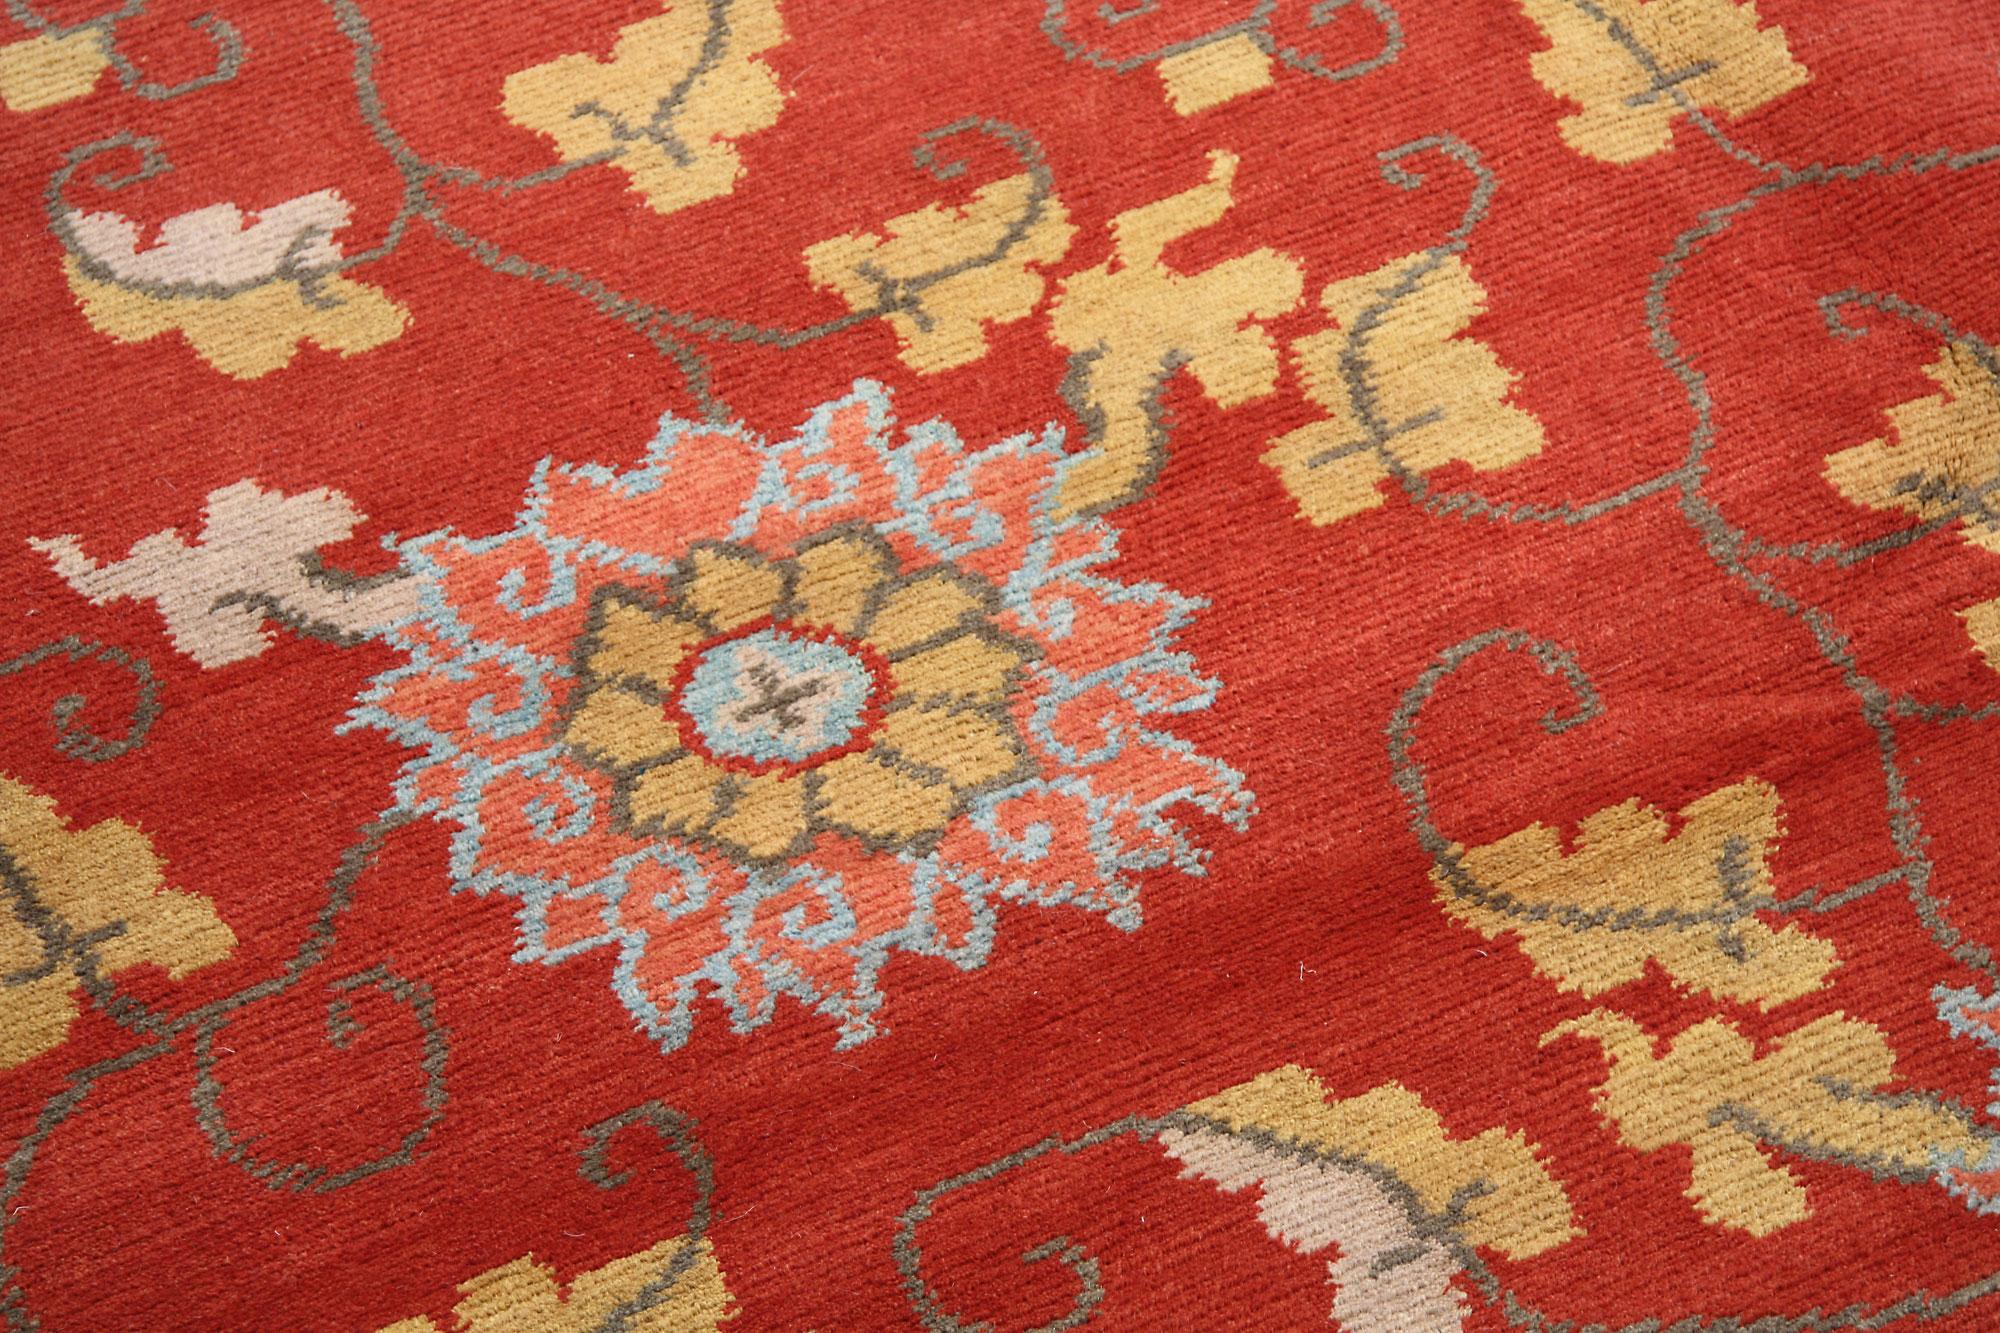 16821_Big-Chrysanthemum_Detail.jpg